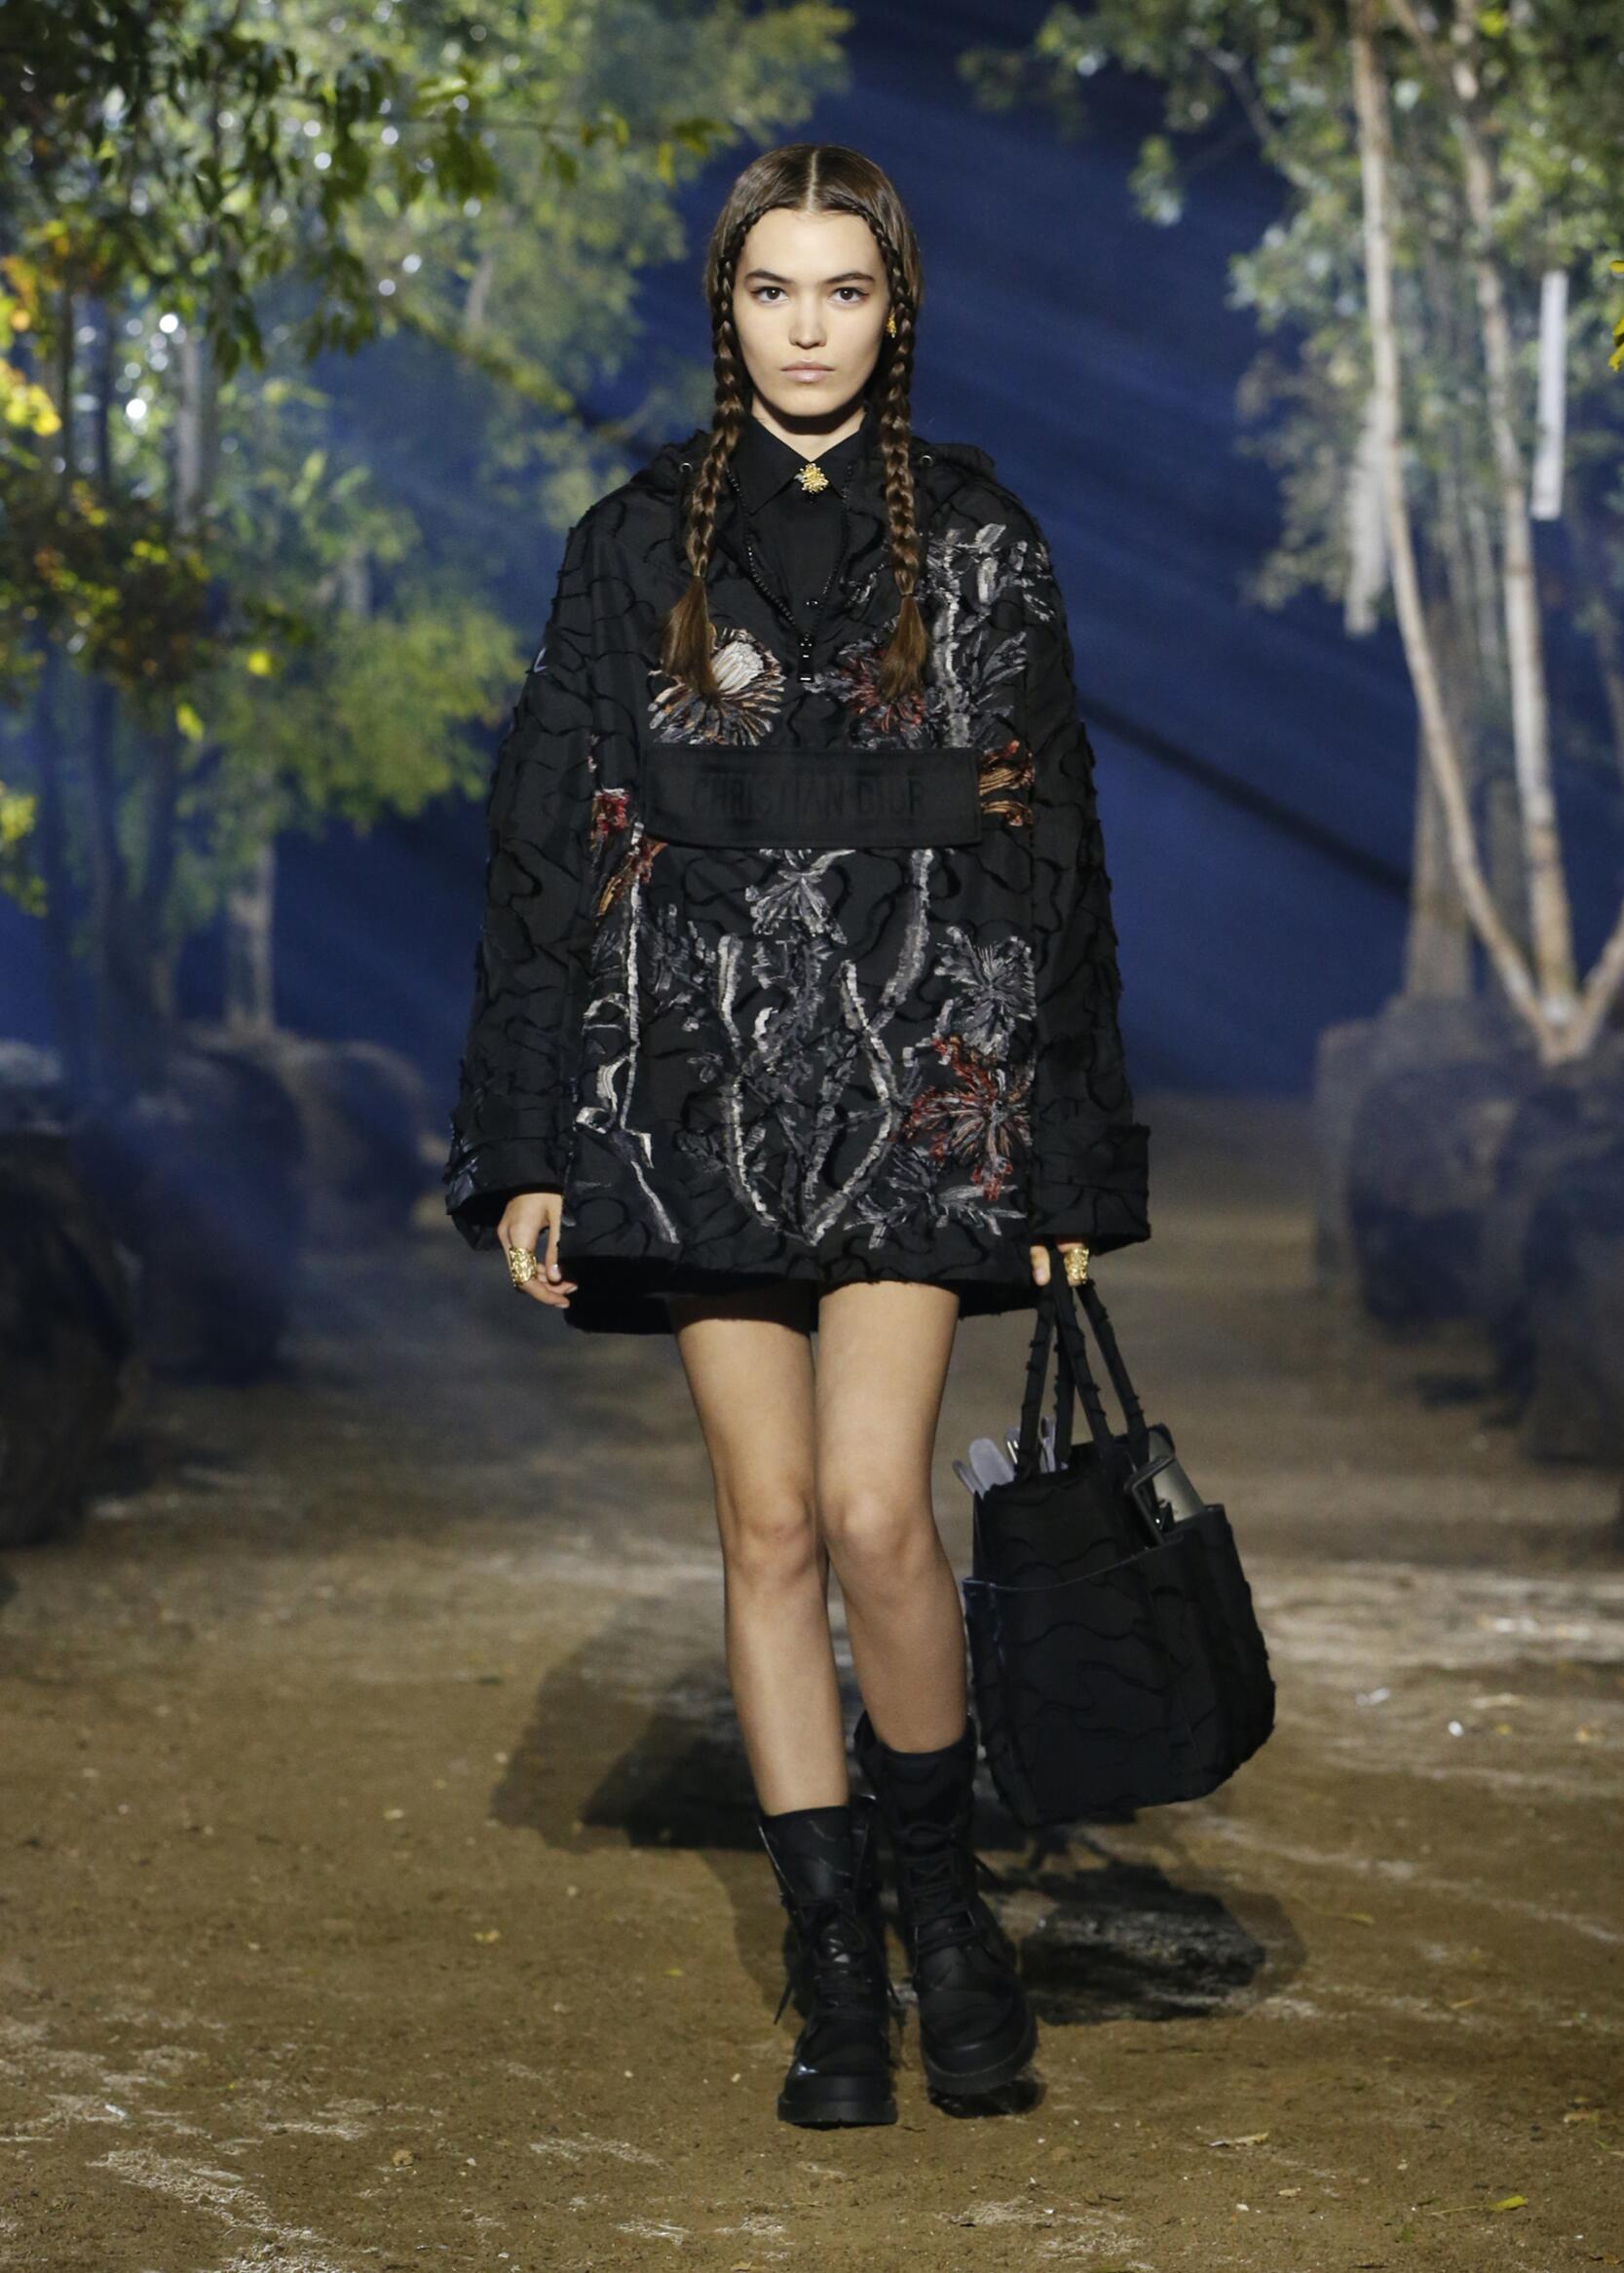 2020 Dior Summer Runway Show